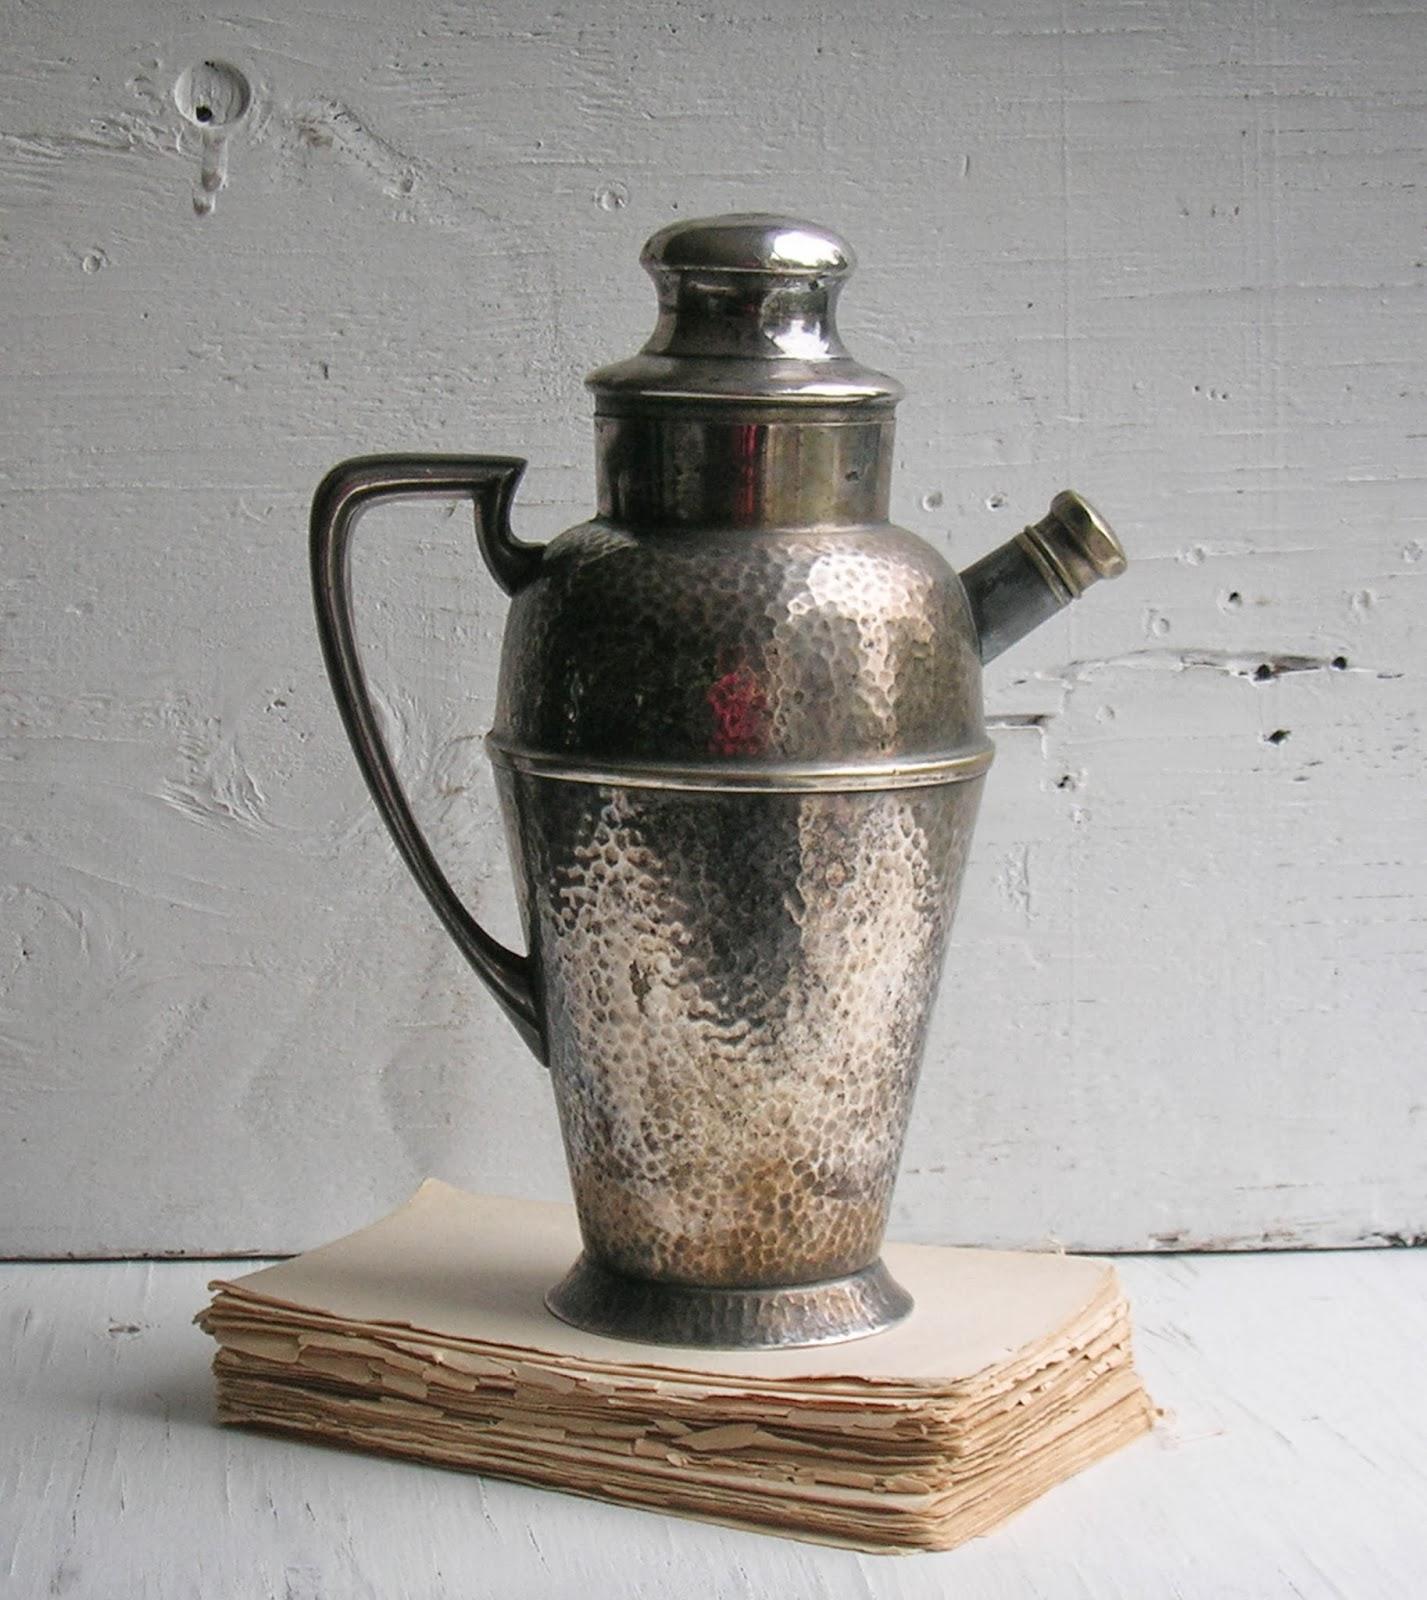 https://www.etsy.com/listing/174254470/vintage-1920s-art-deco-hammered-silver?ref=shop_home_active